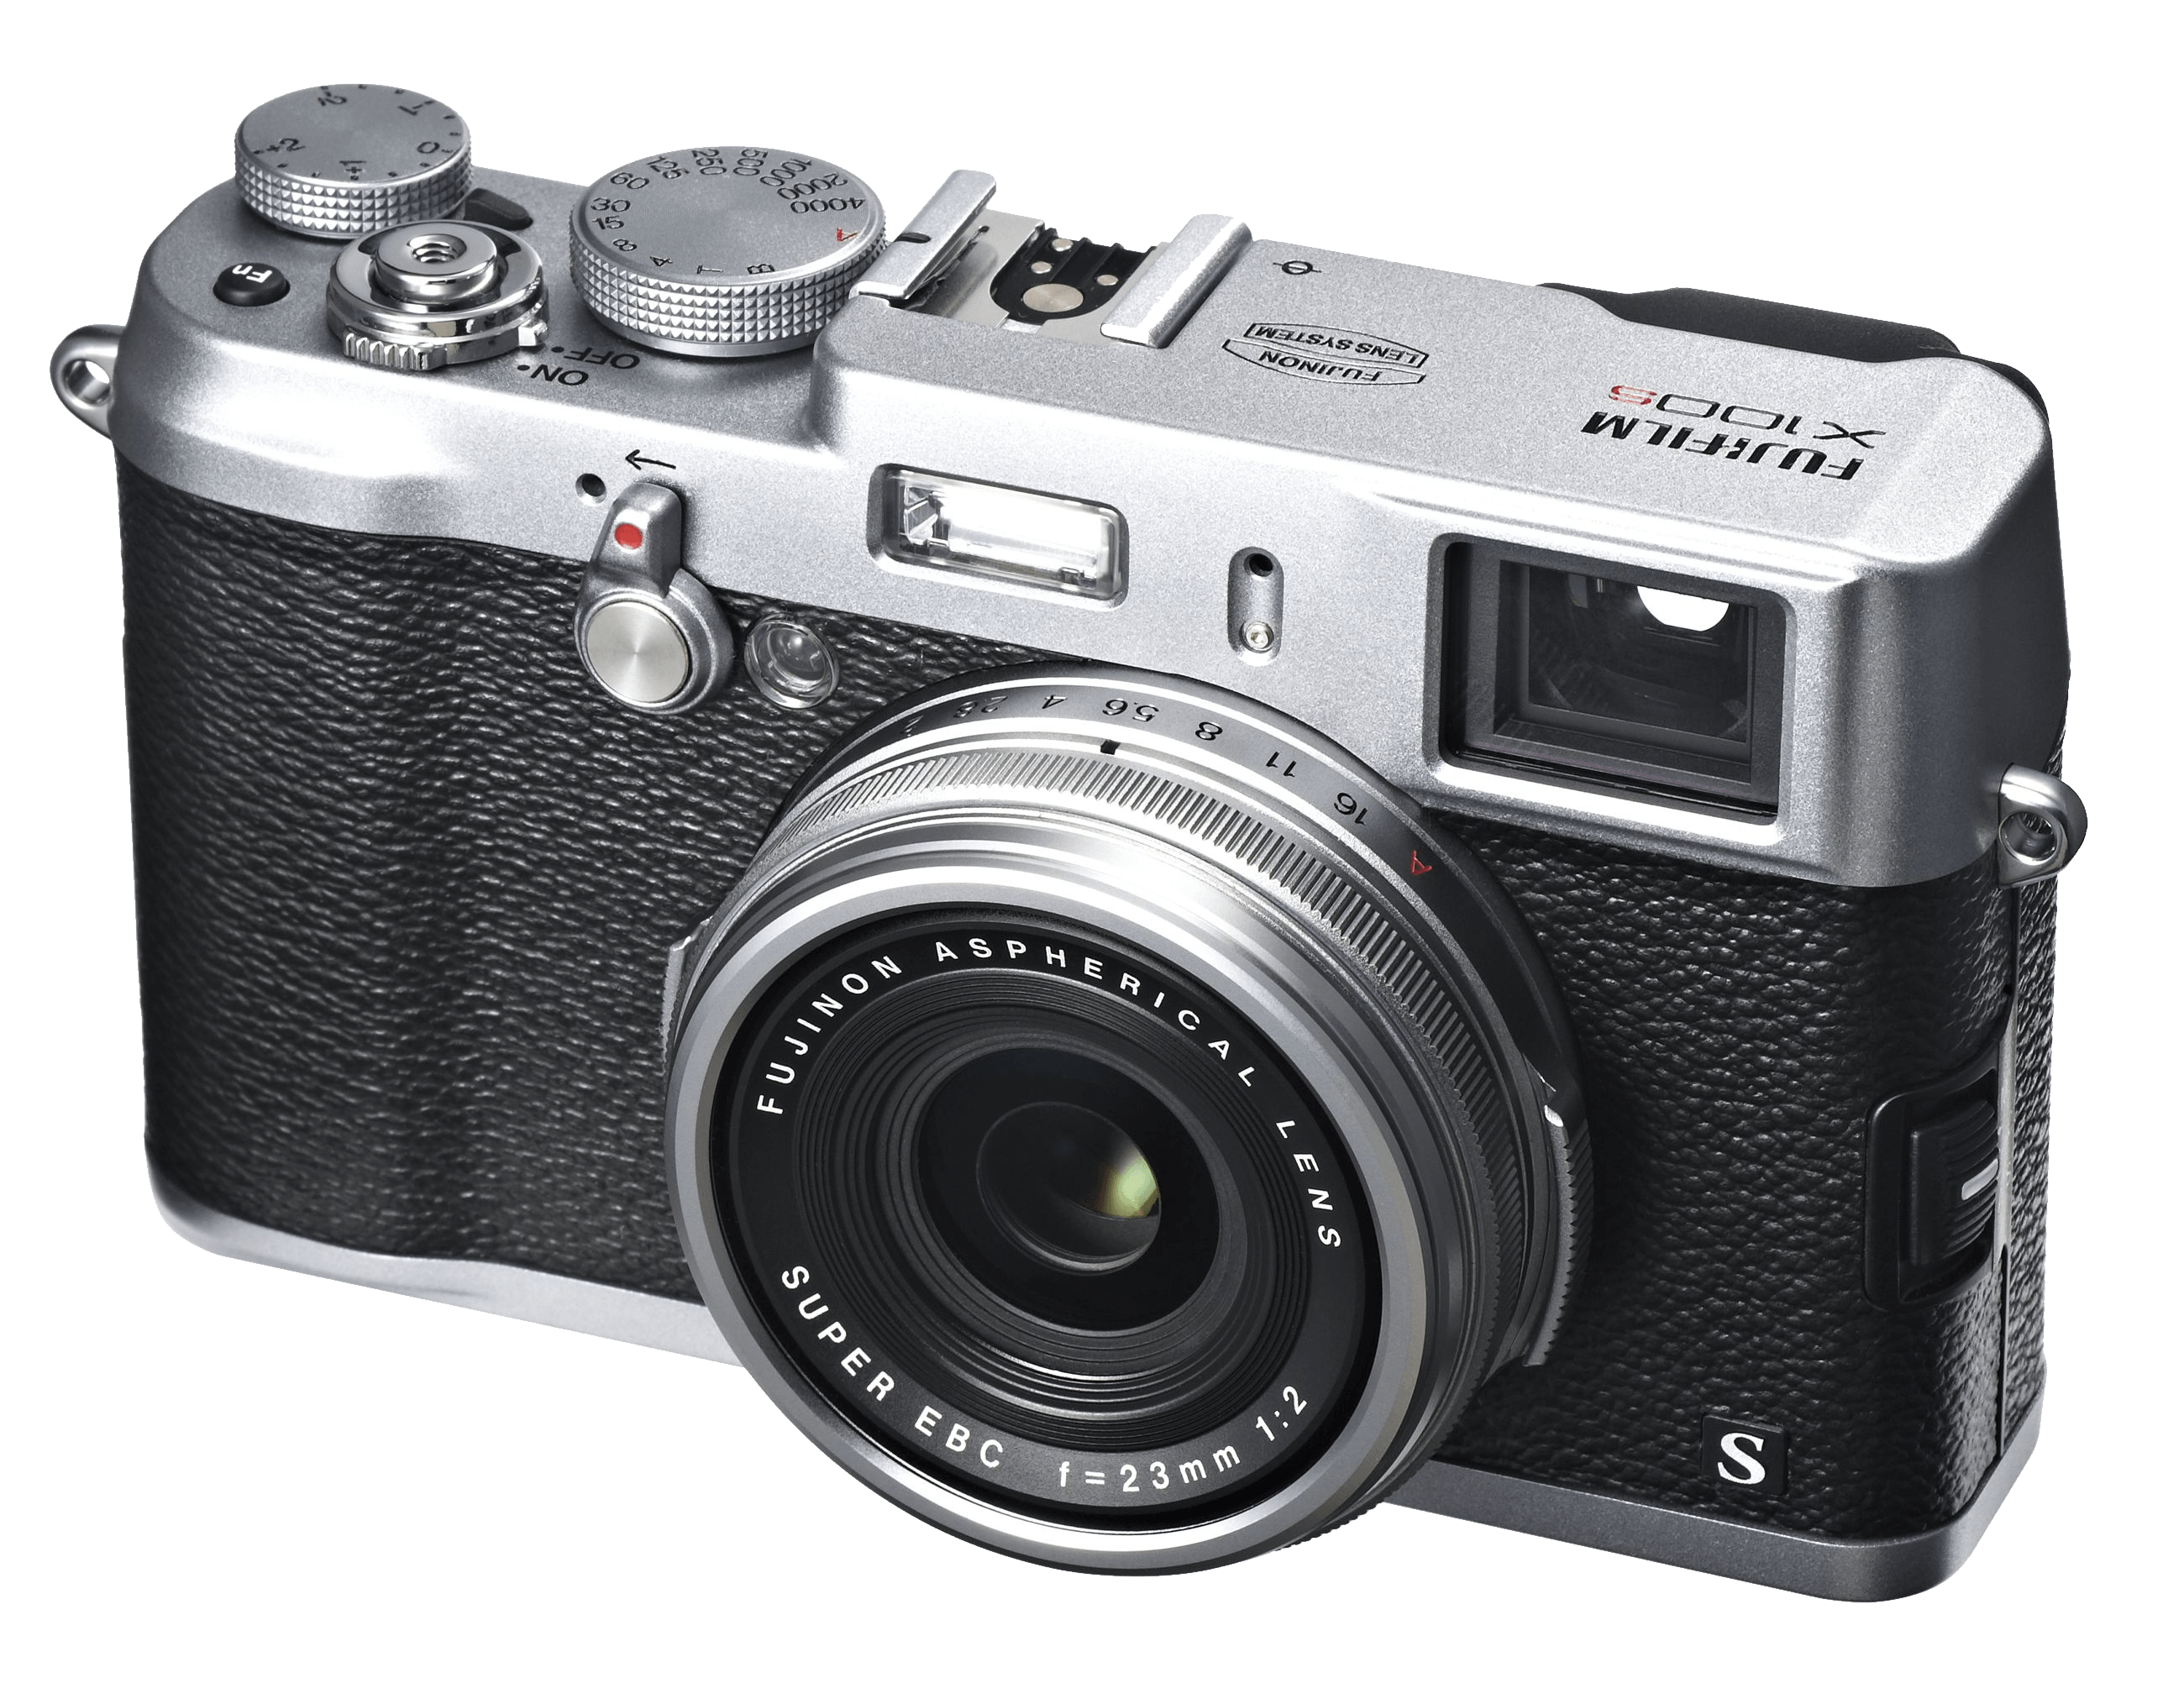 Fuji X100s Photo Camera transparent PNG.